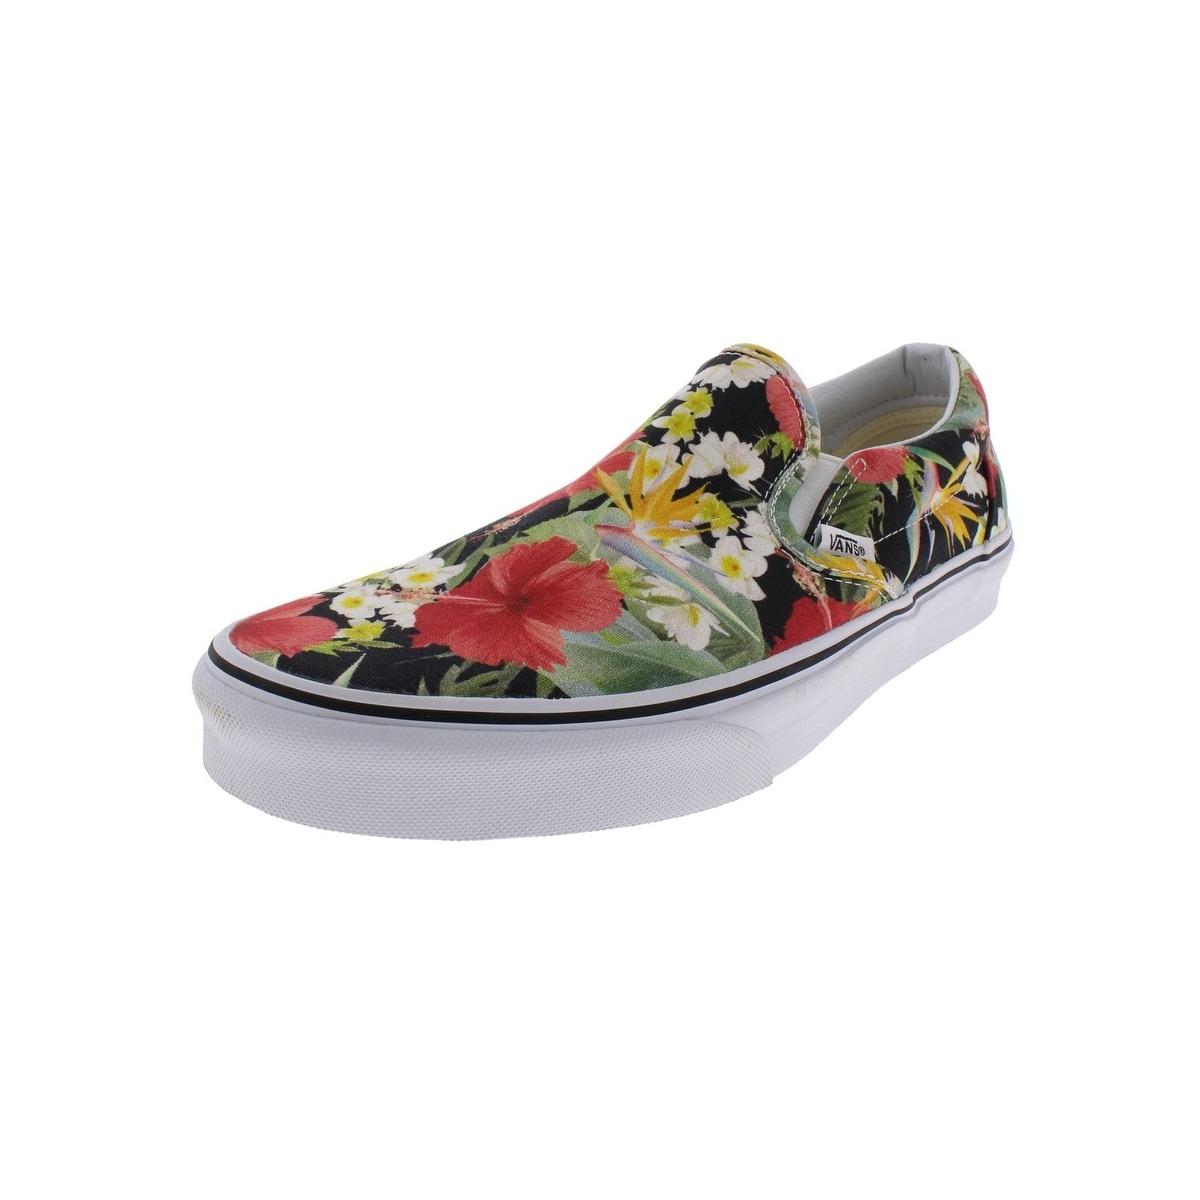 3dd9ba9343 Red Vans Shoes